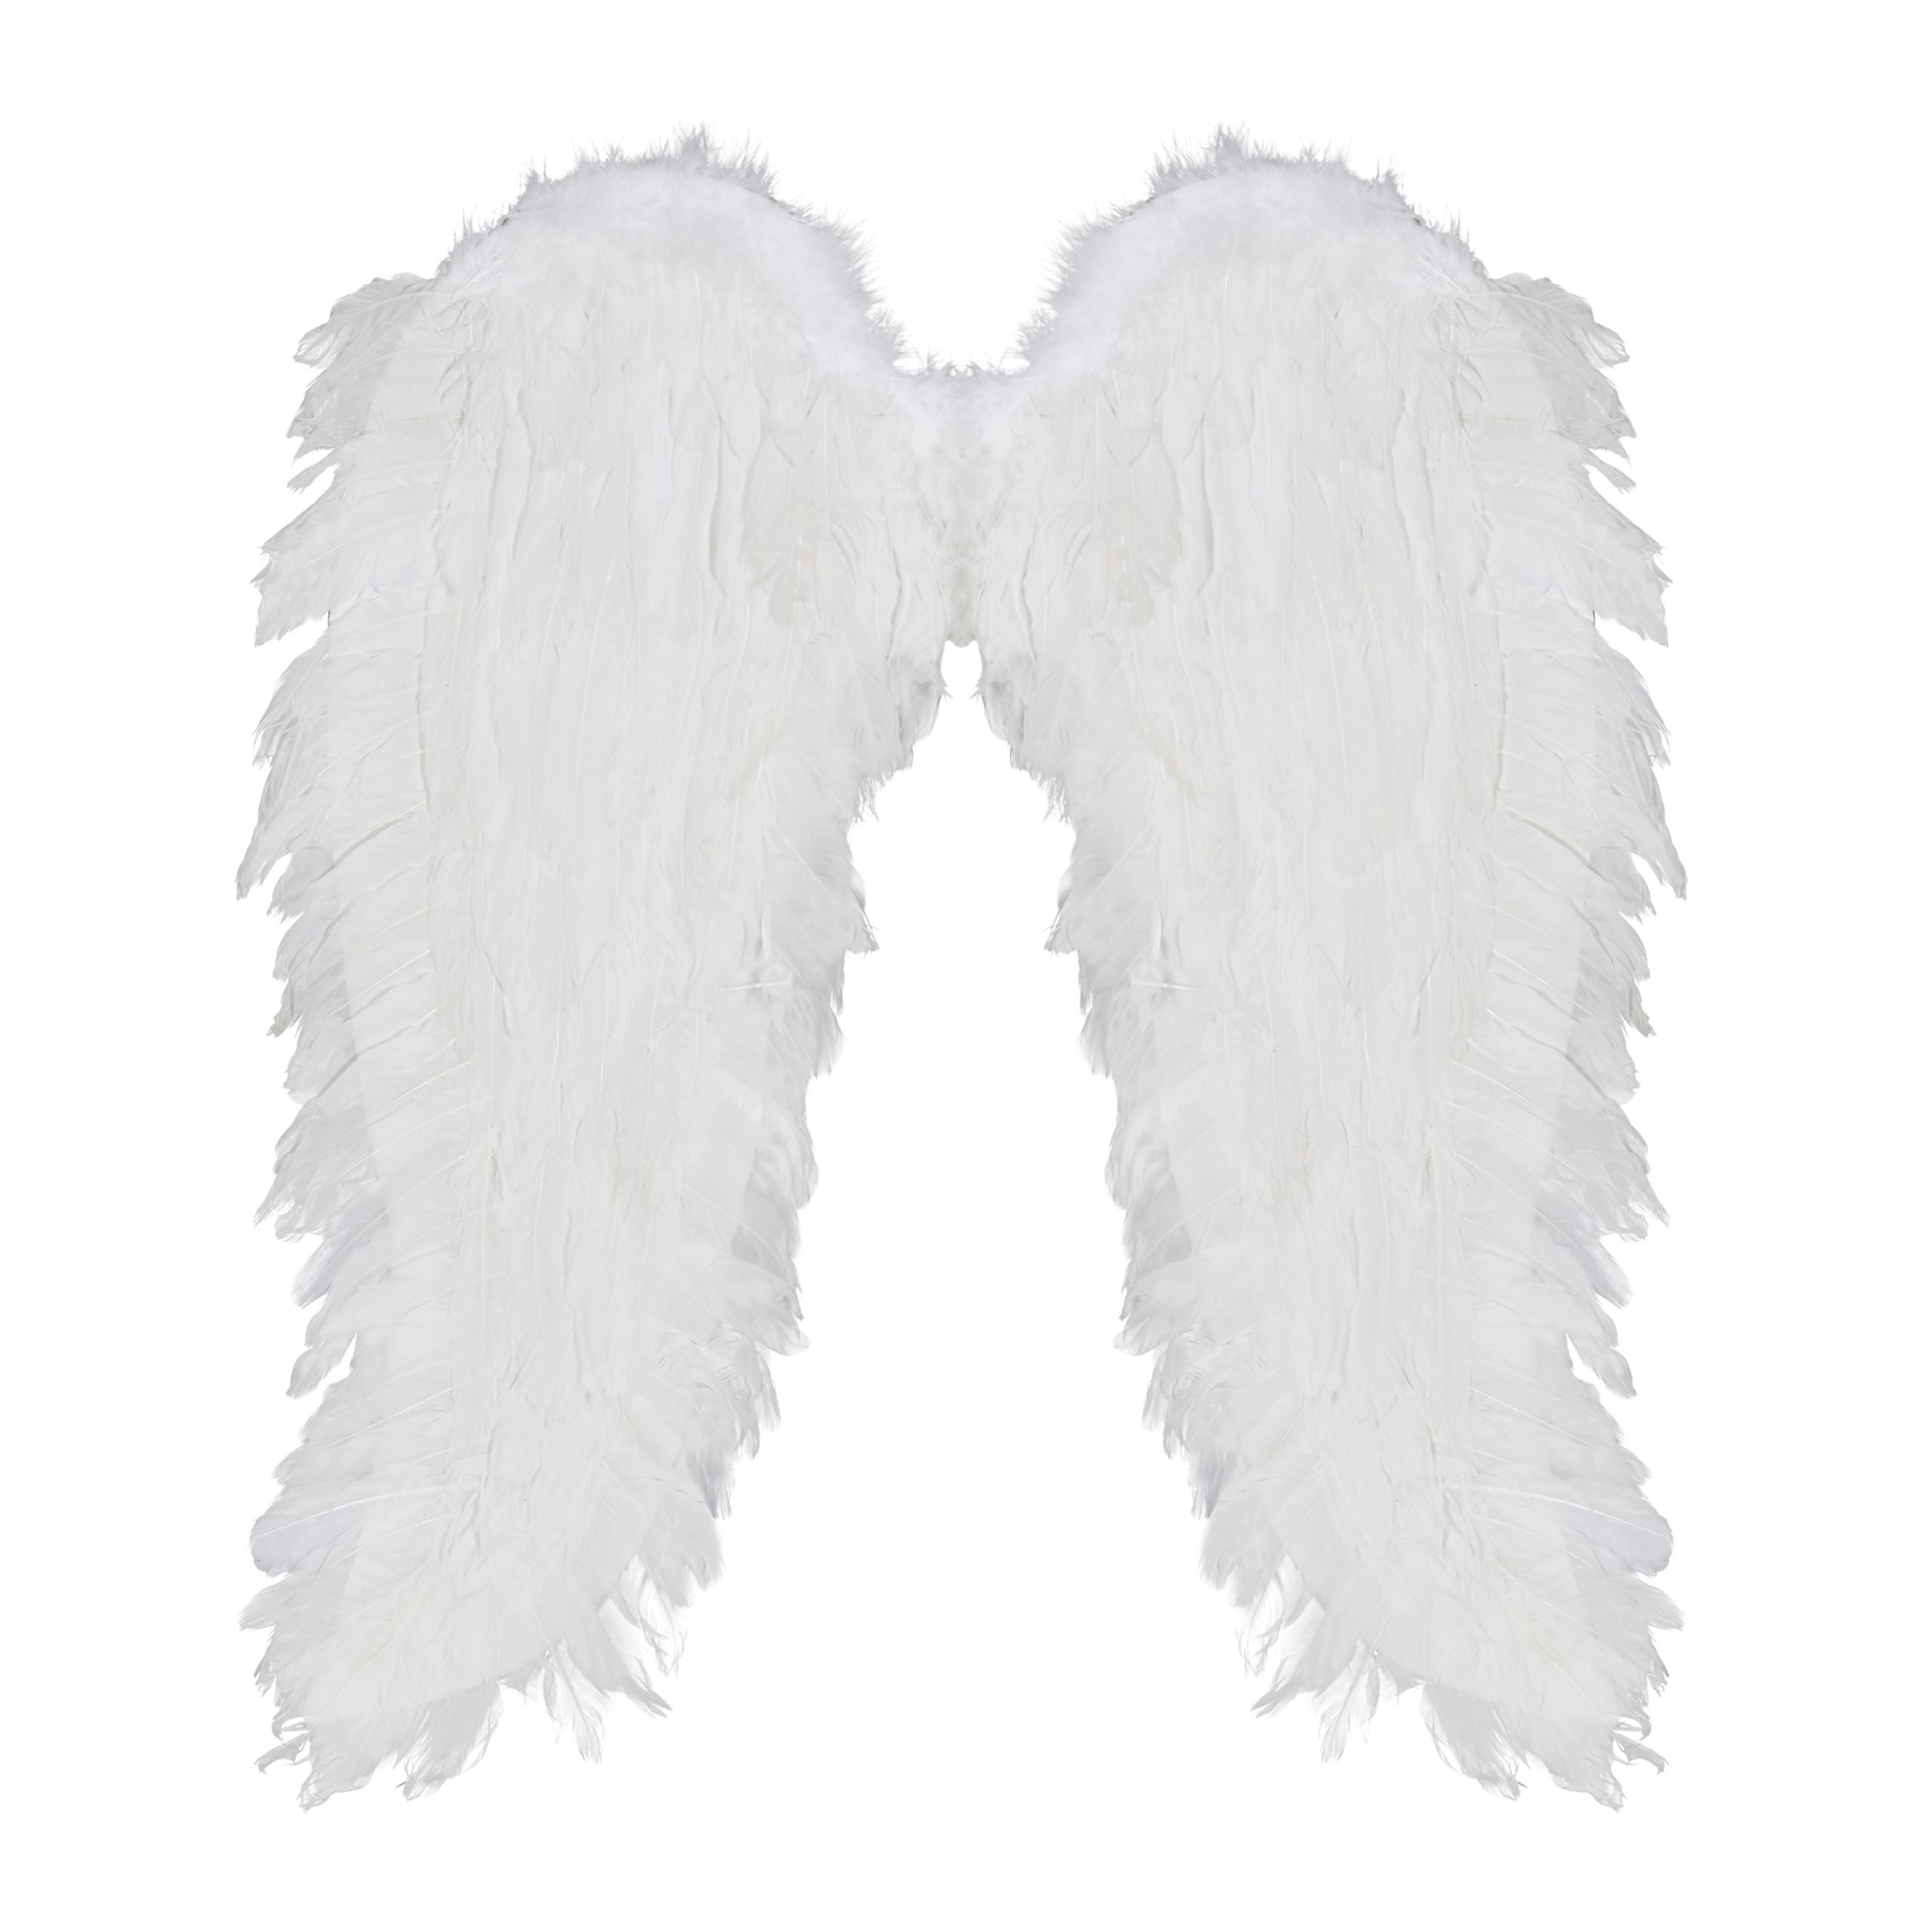 vleugels-verkleedkleding-XXL-engelenvleugels-engelkostuum-kunstveren miniatuur 5